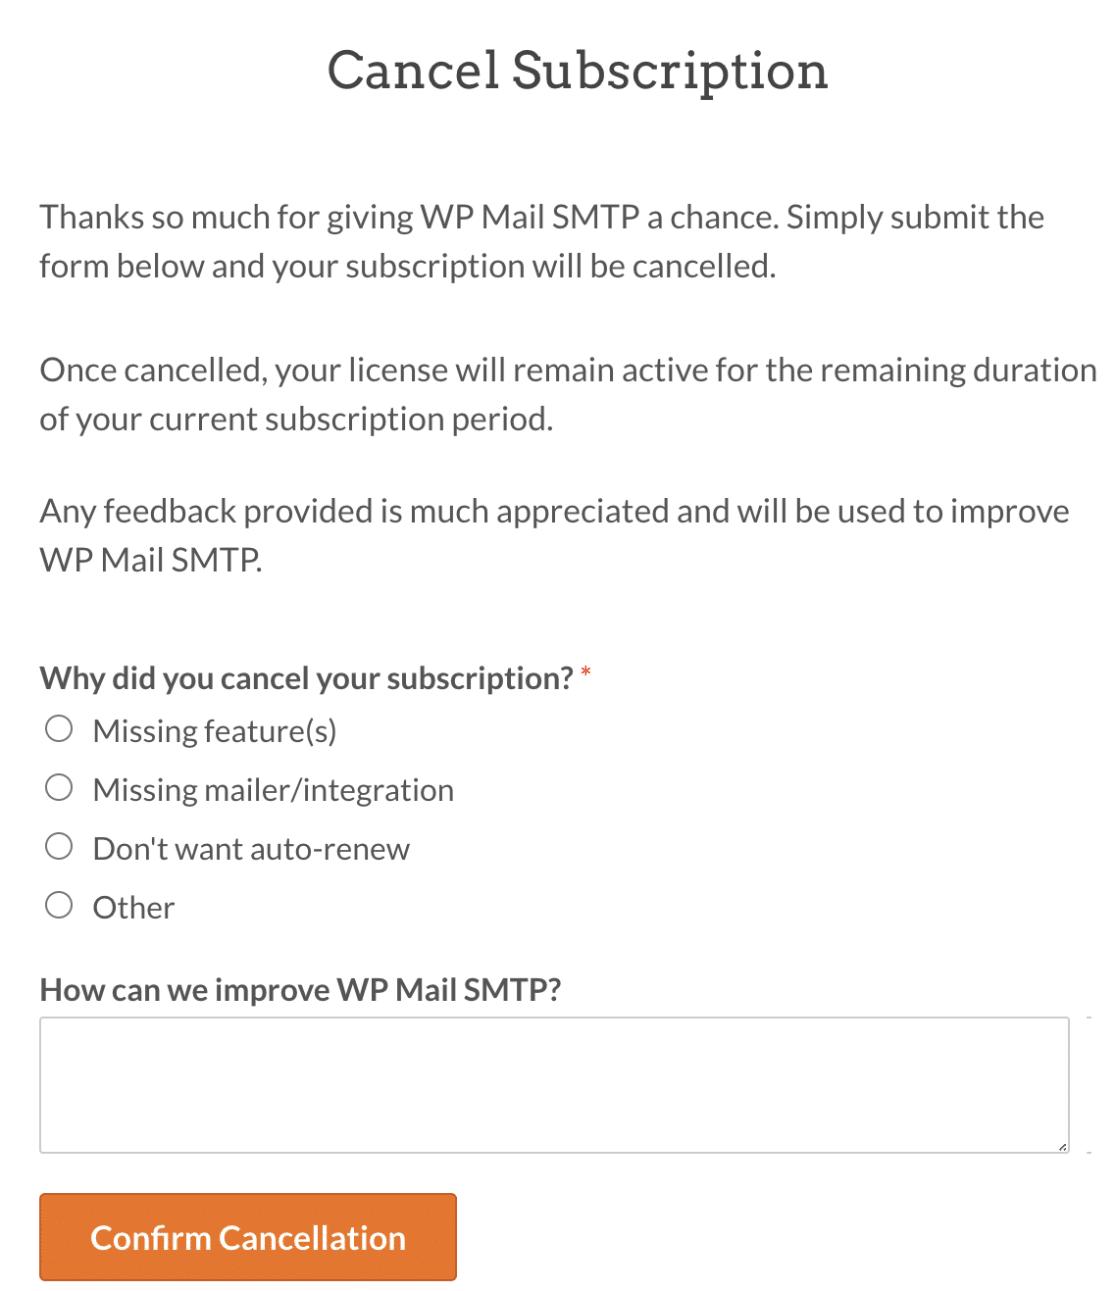 Cancellation survey